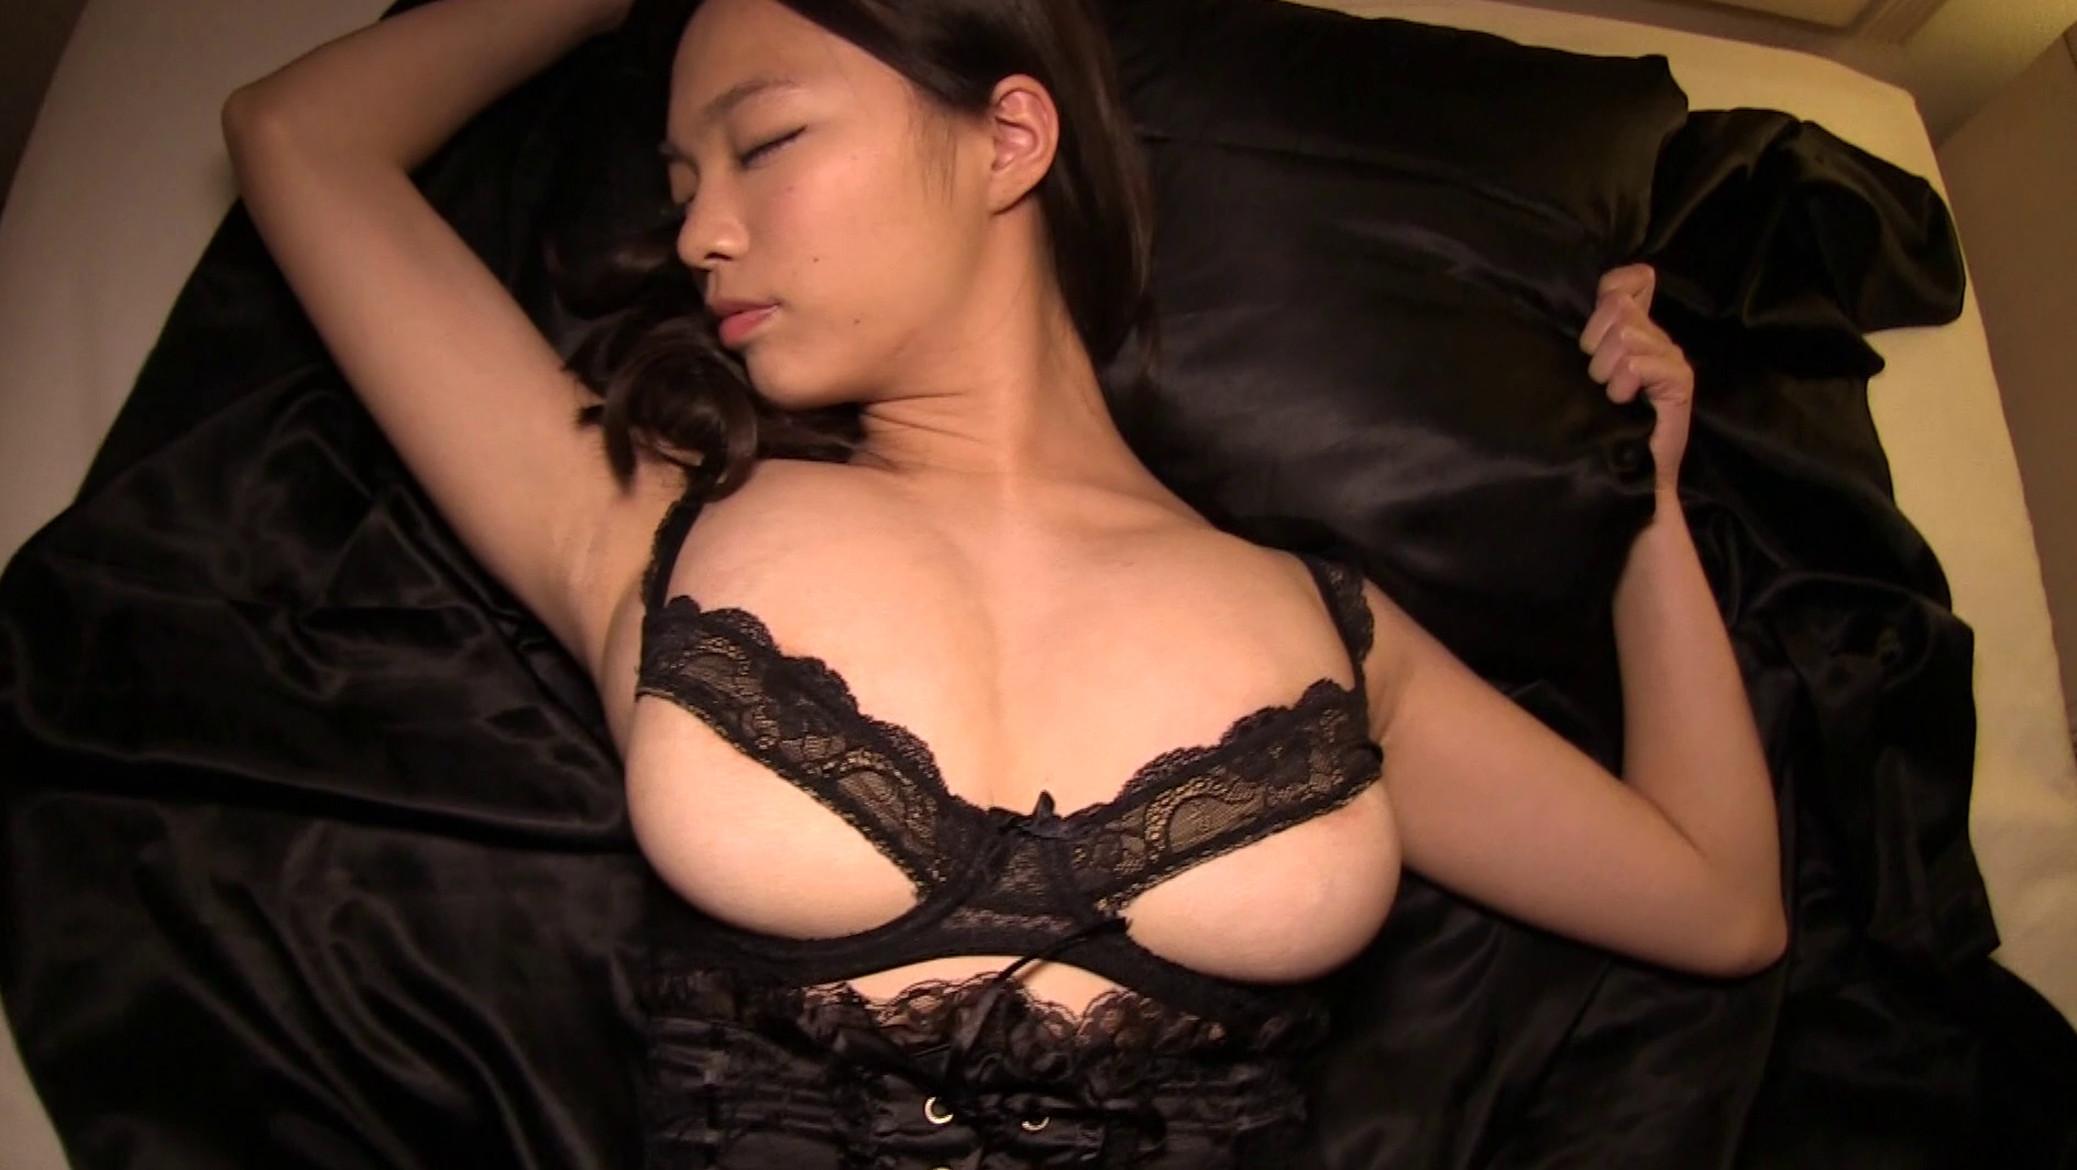 Mio Takaba's sexy lingerie pics